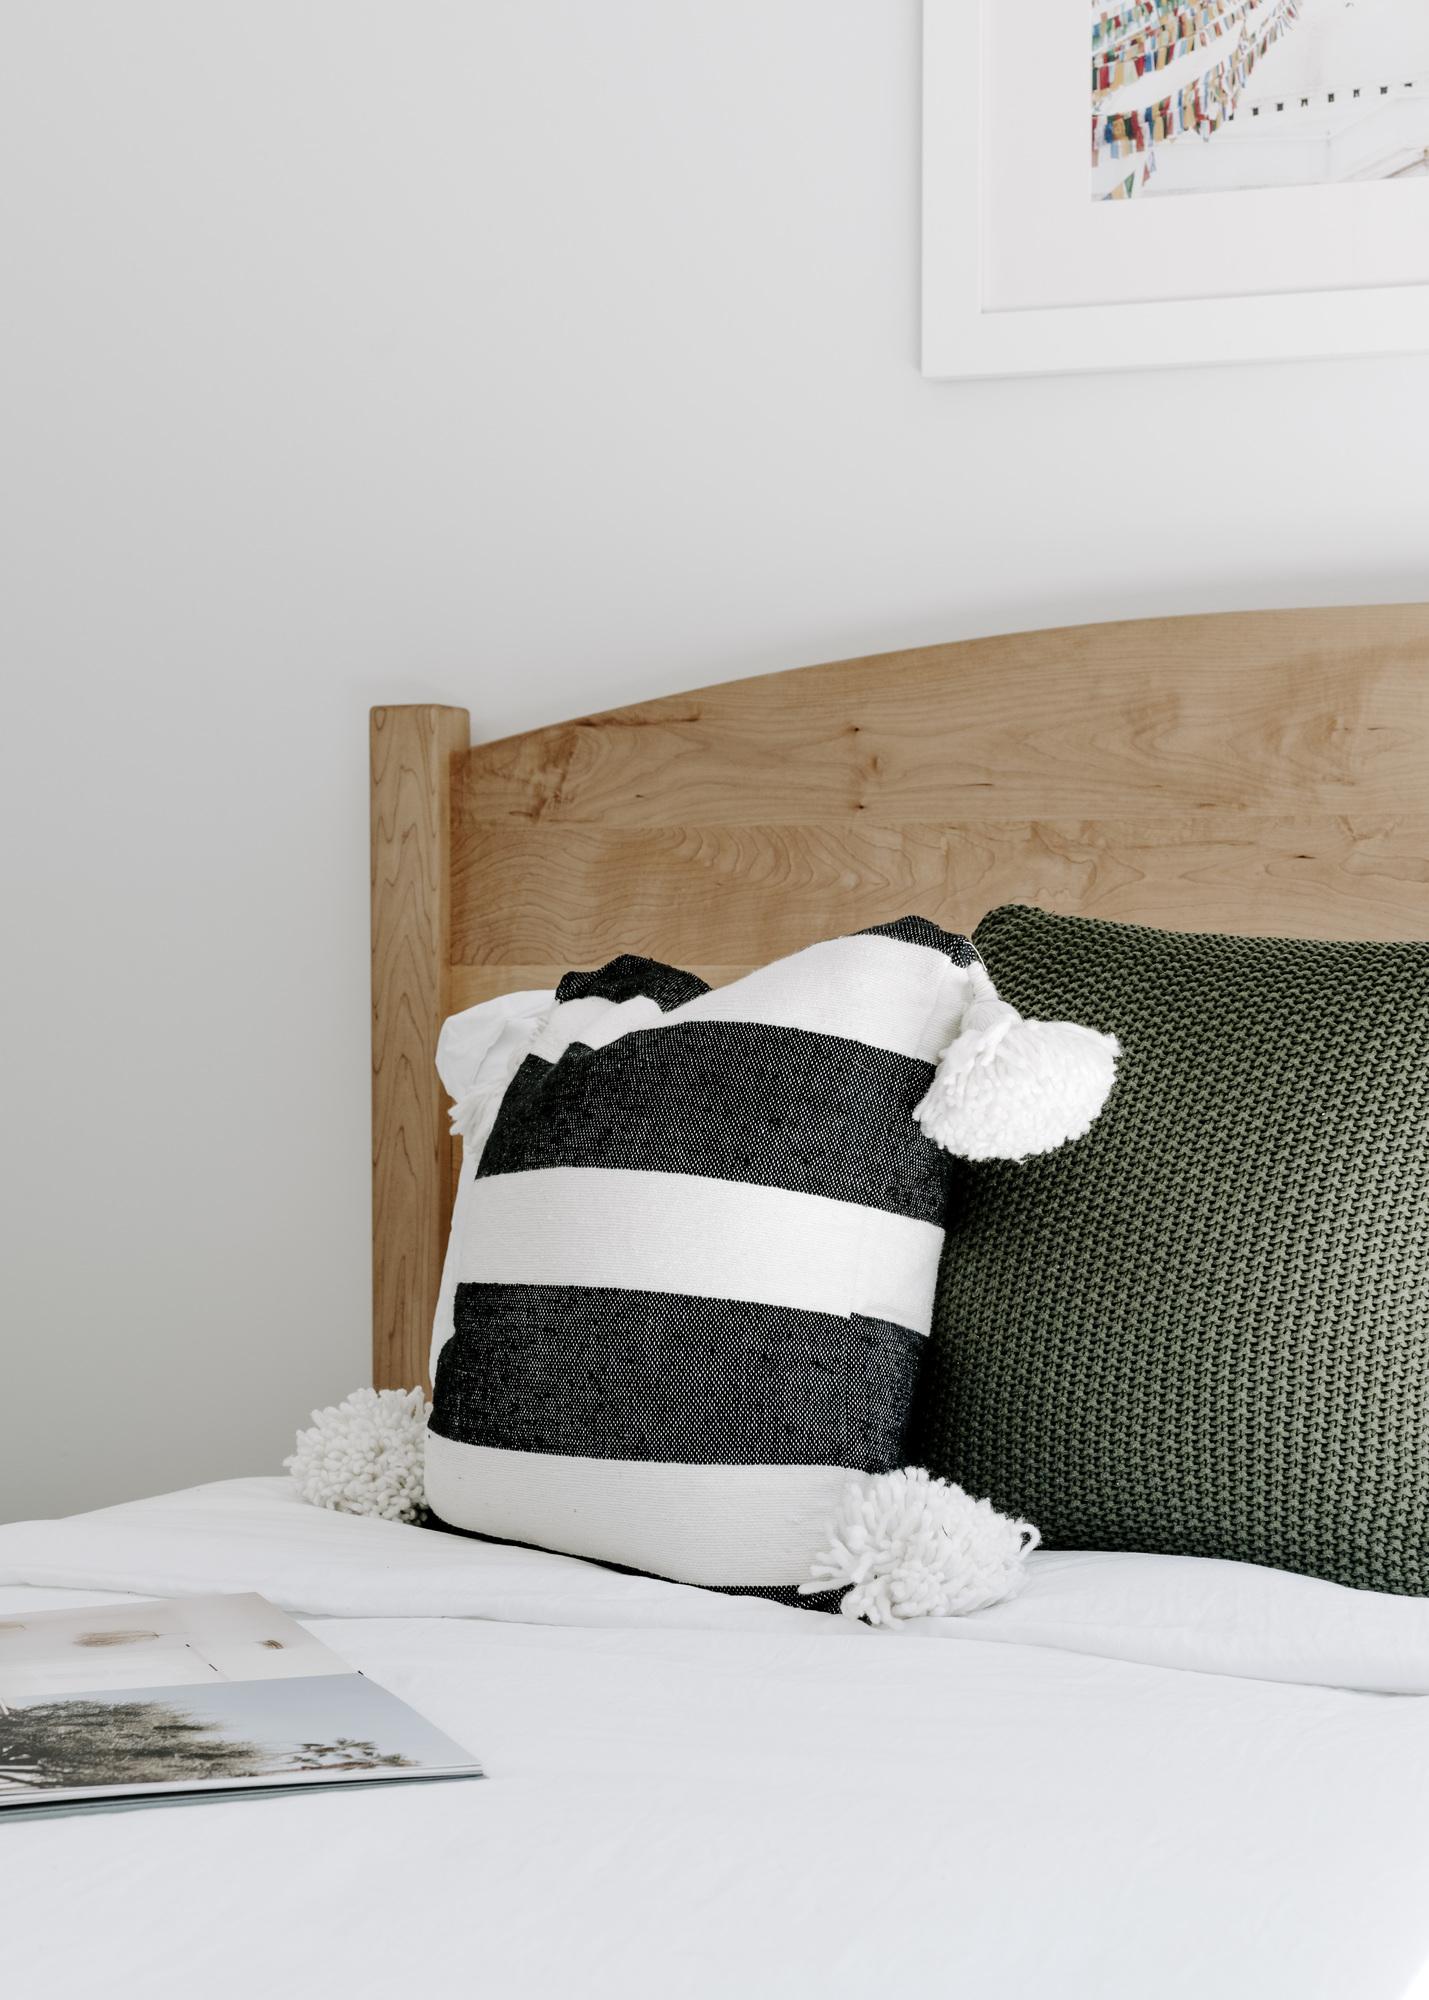 Moroccan Pom-Pom Pillow Cover - Black